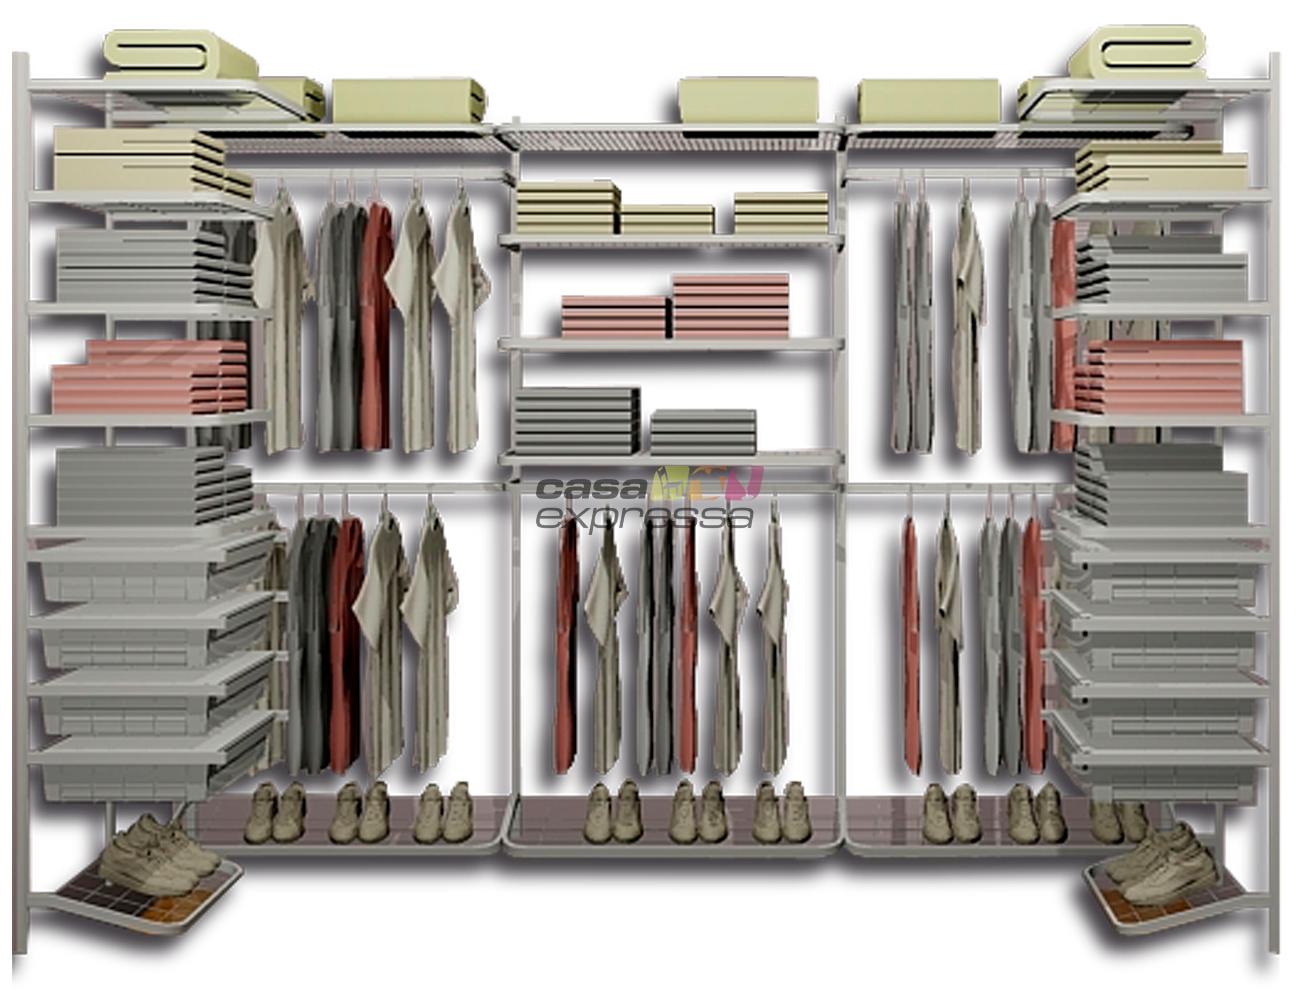 Closet Aramado em U CLU05 - 2,80m x 1,20m x 1,20m - CASA EXPRESSA